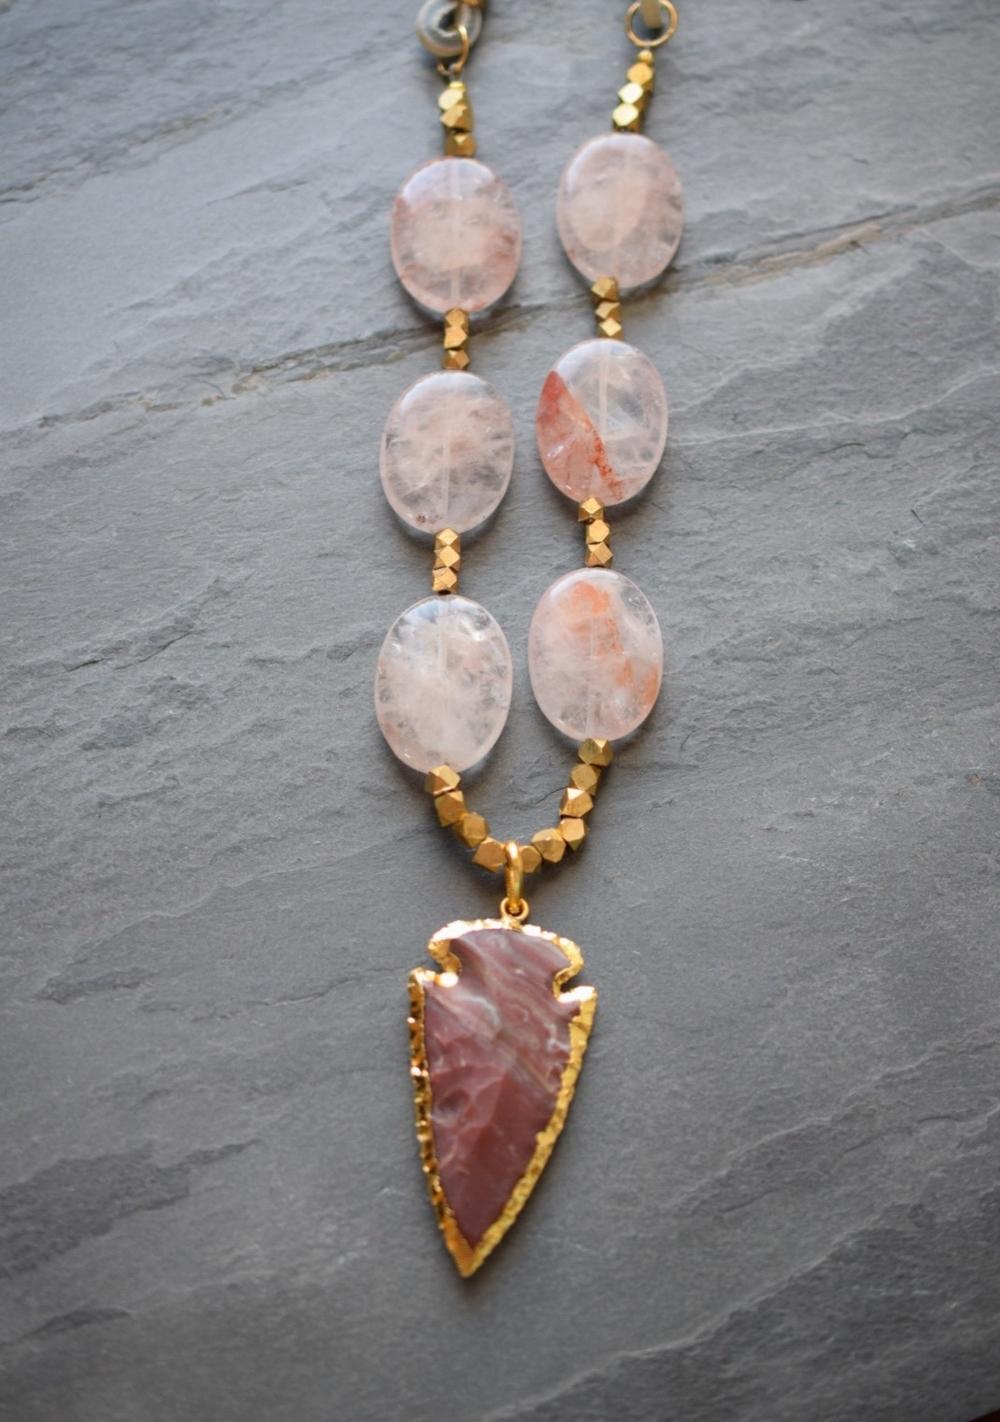 Rose Quartz Arrowhead Necklace, available  here